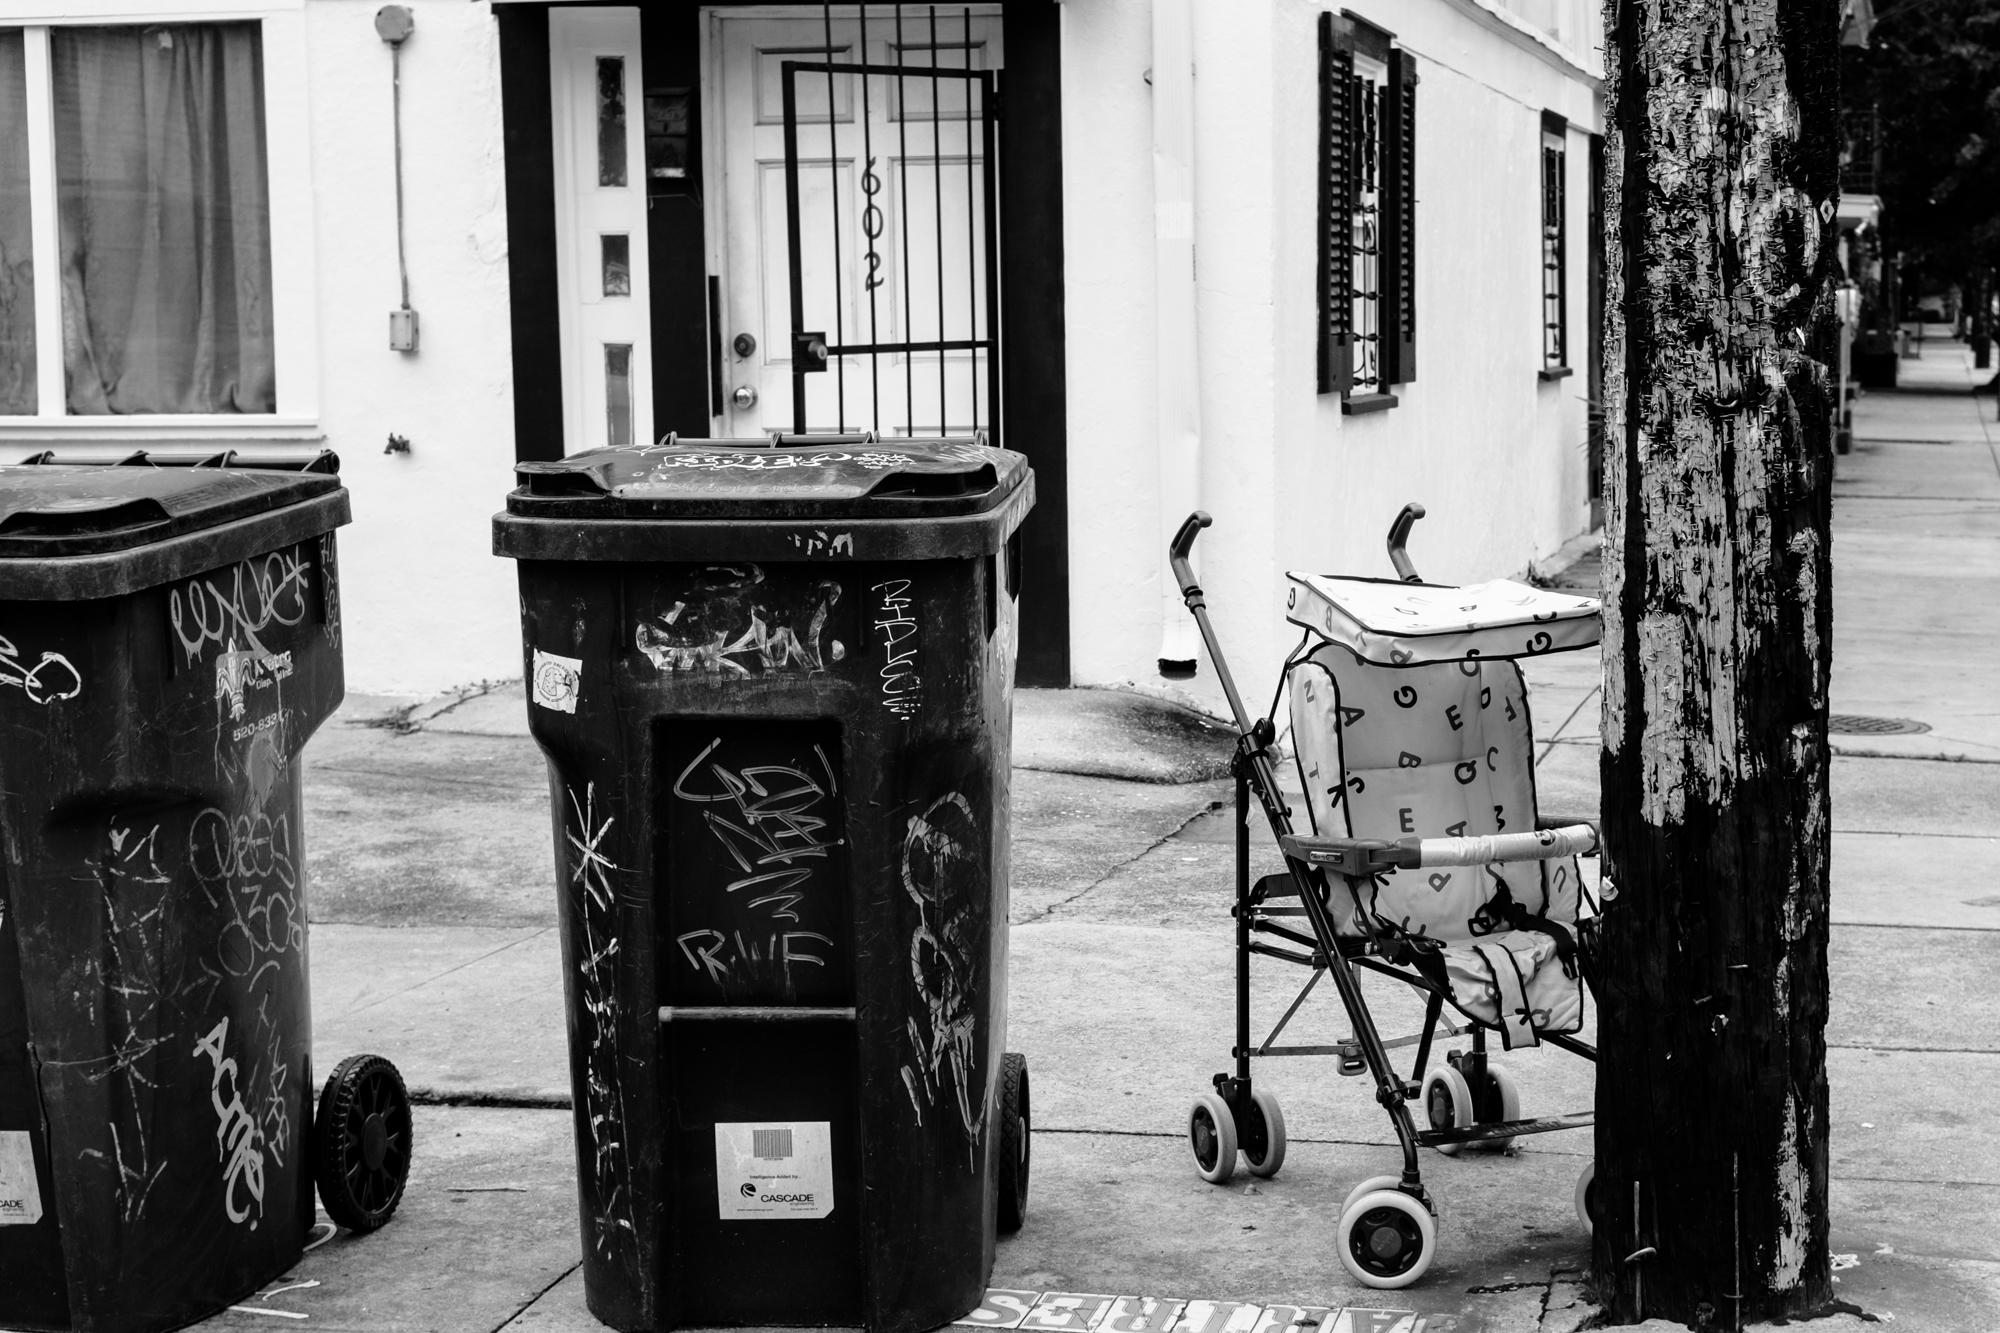 Carlos_Detres_Photo20150416-DSCF5305.jpg